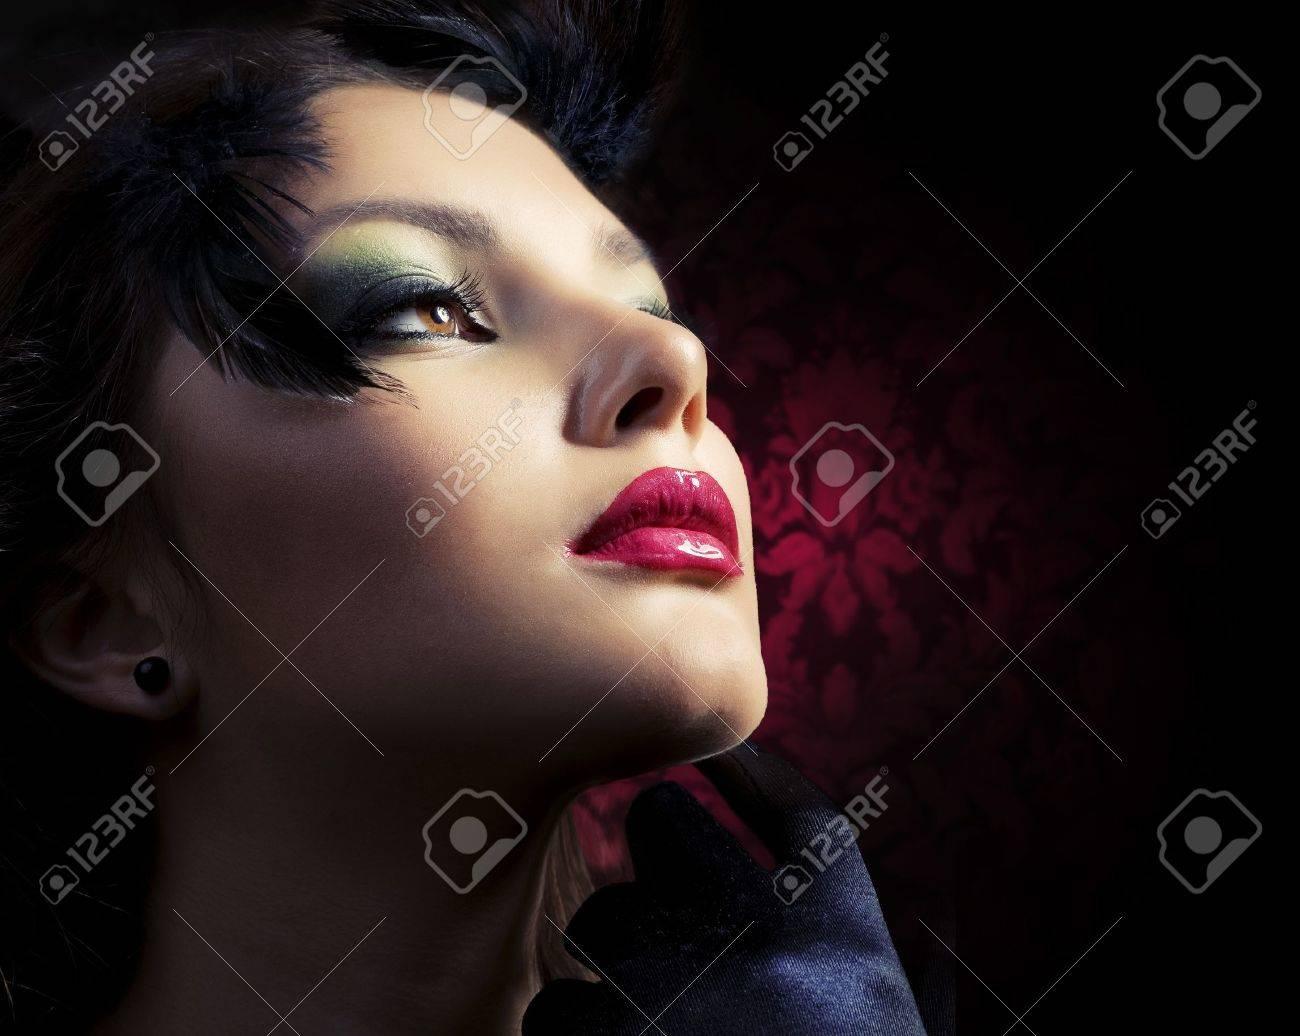 Luxury Woman portrait Stock Photo - 10996528